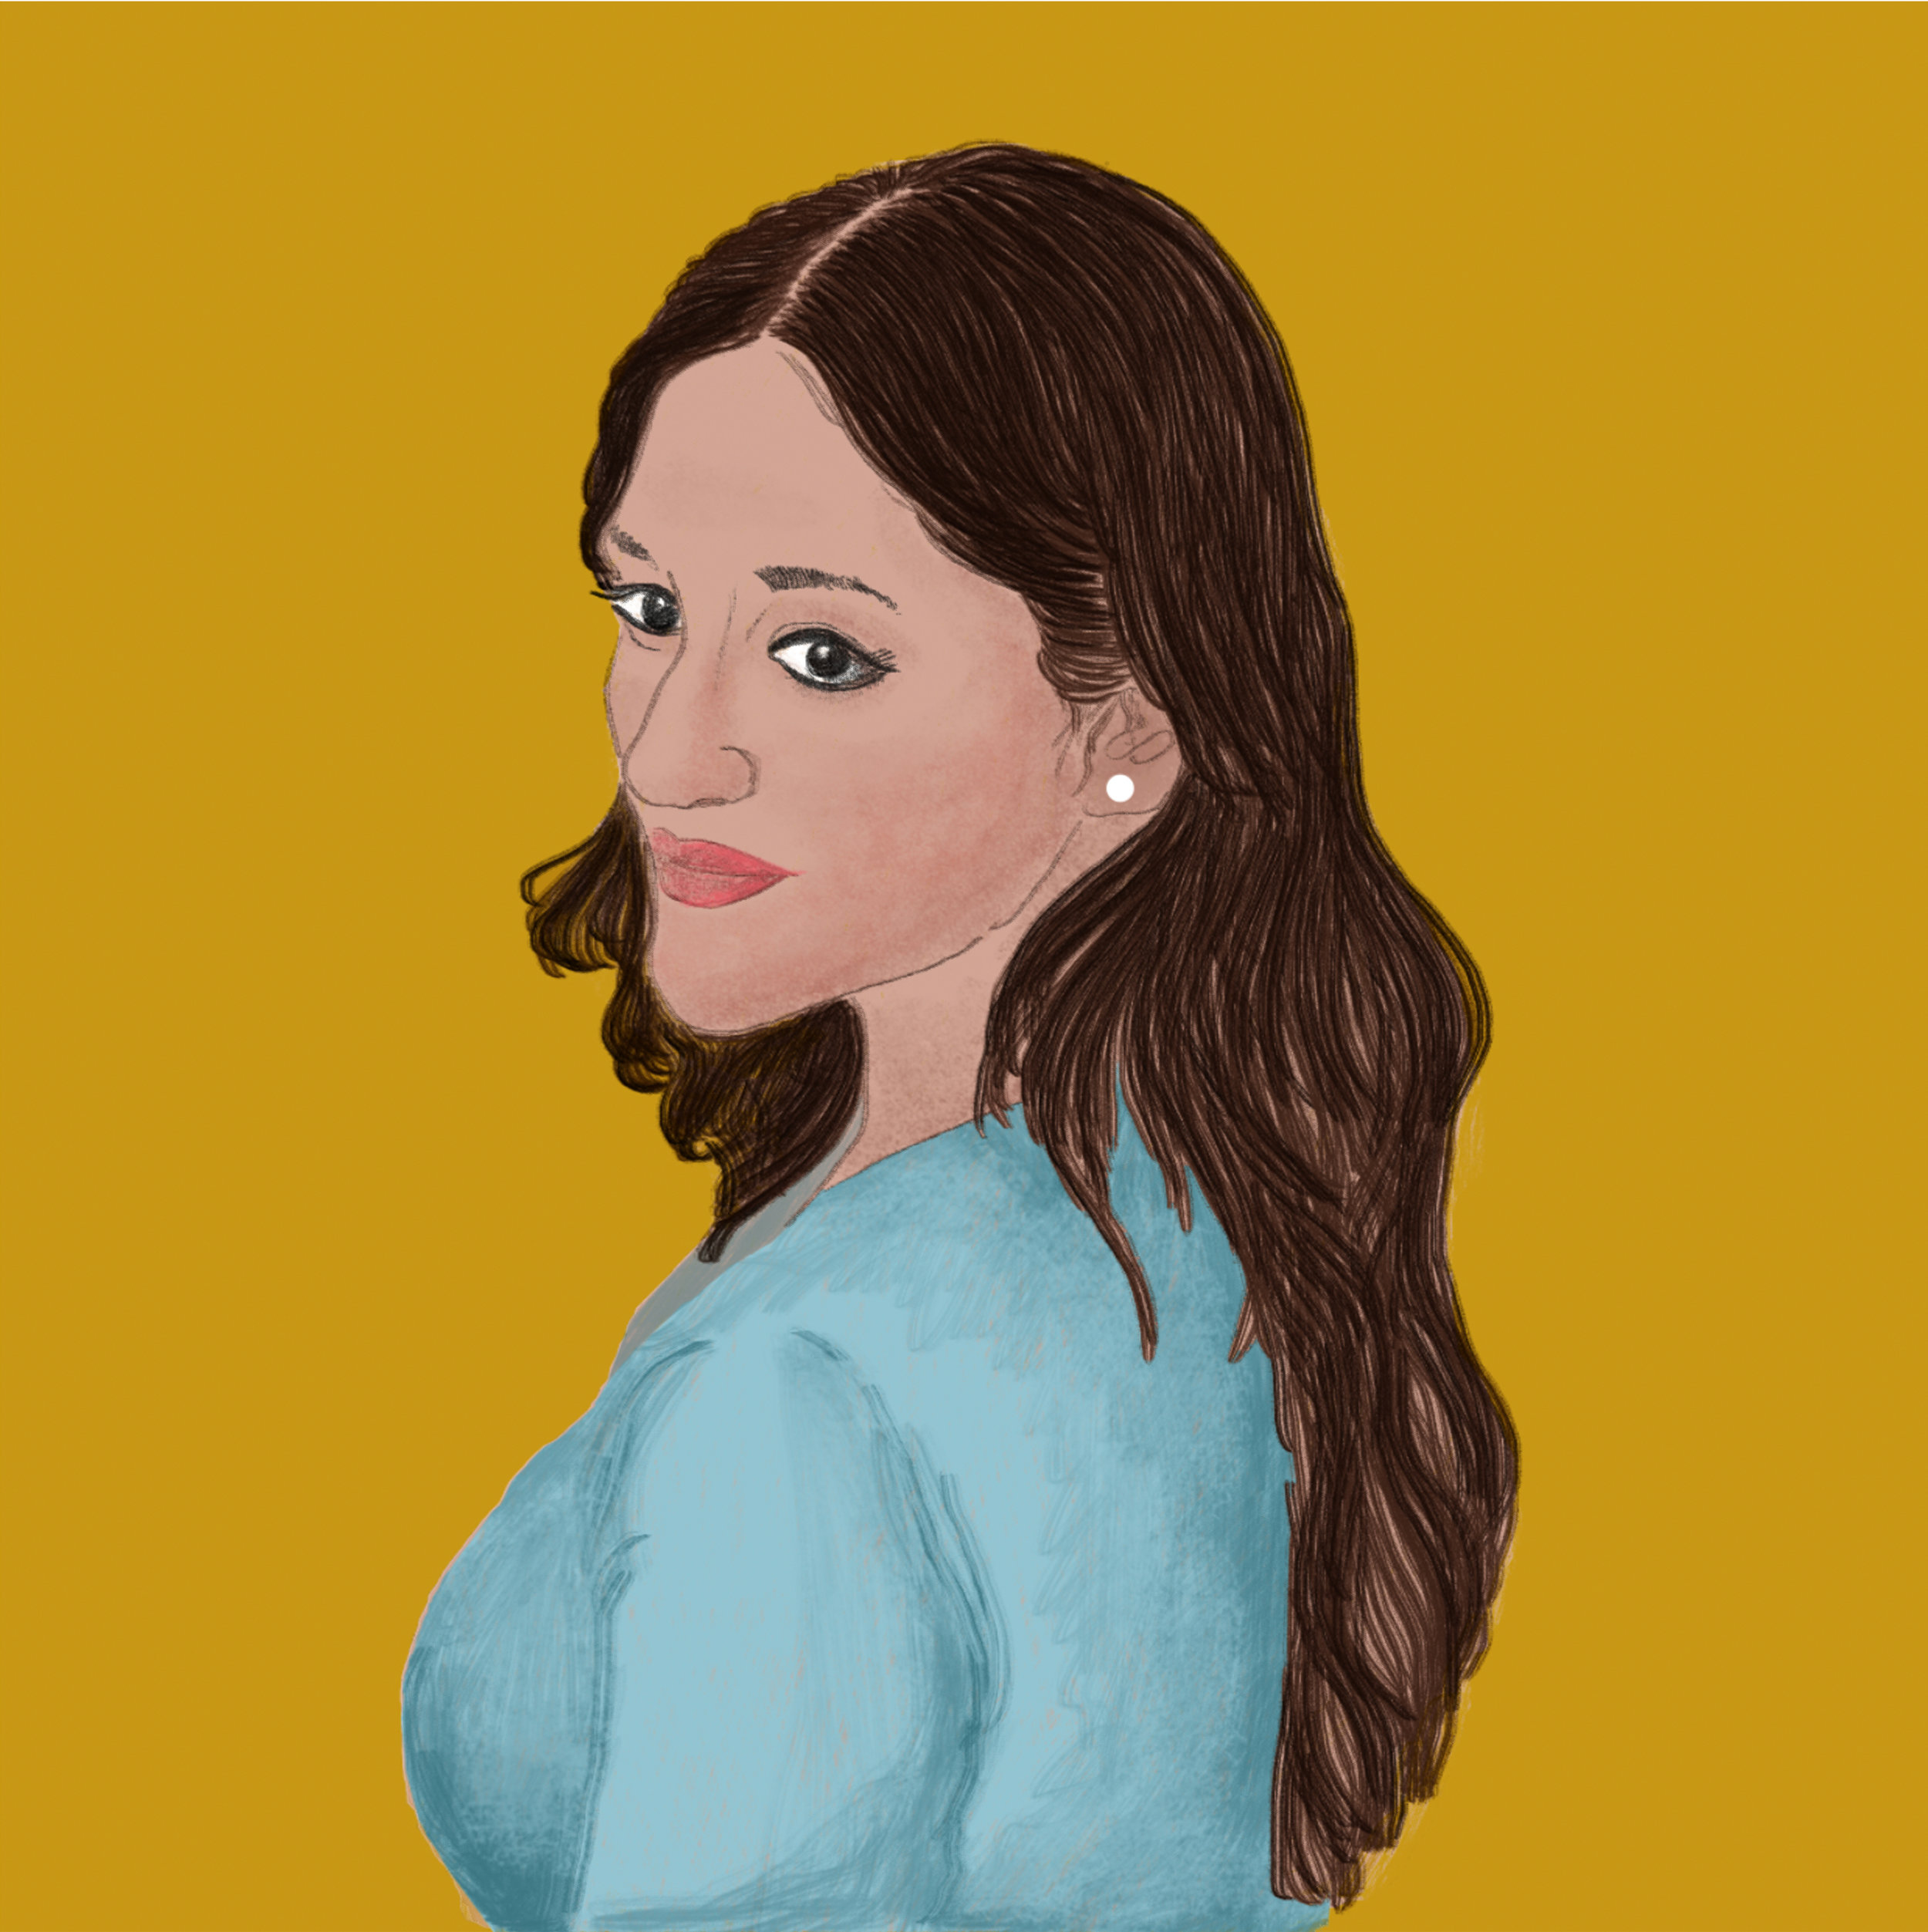 Illustrated by Harshita Borah